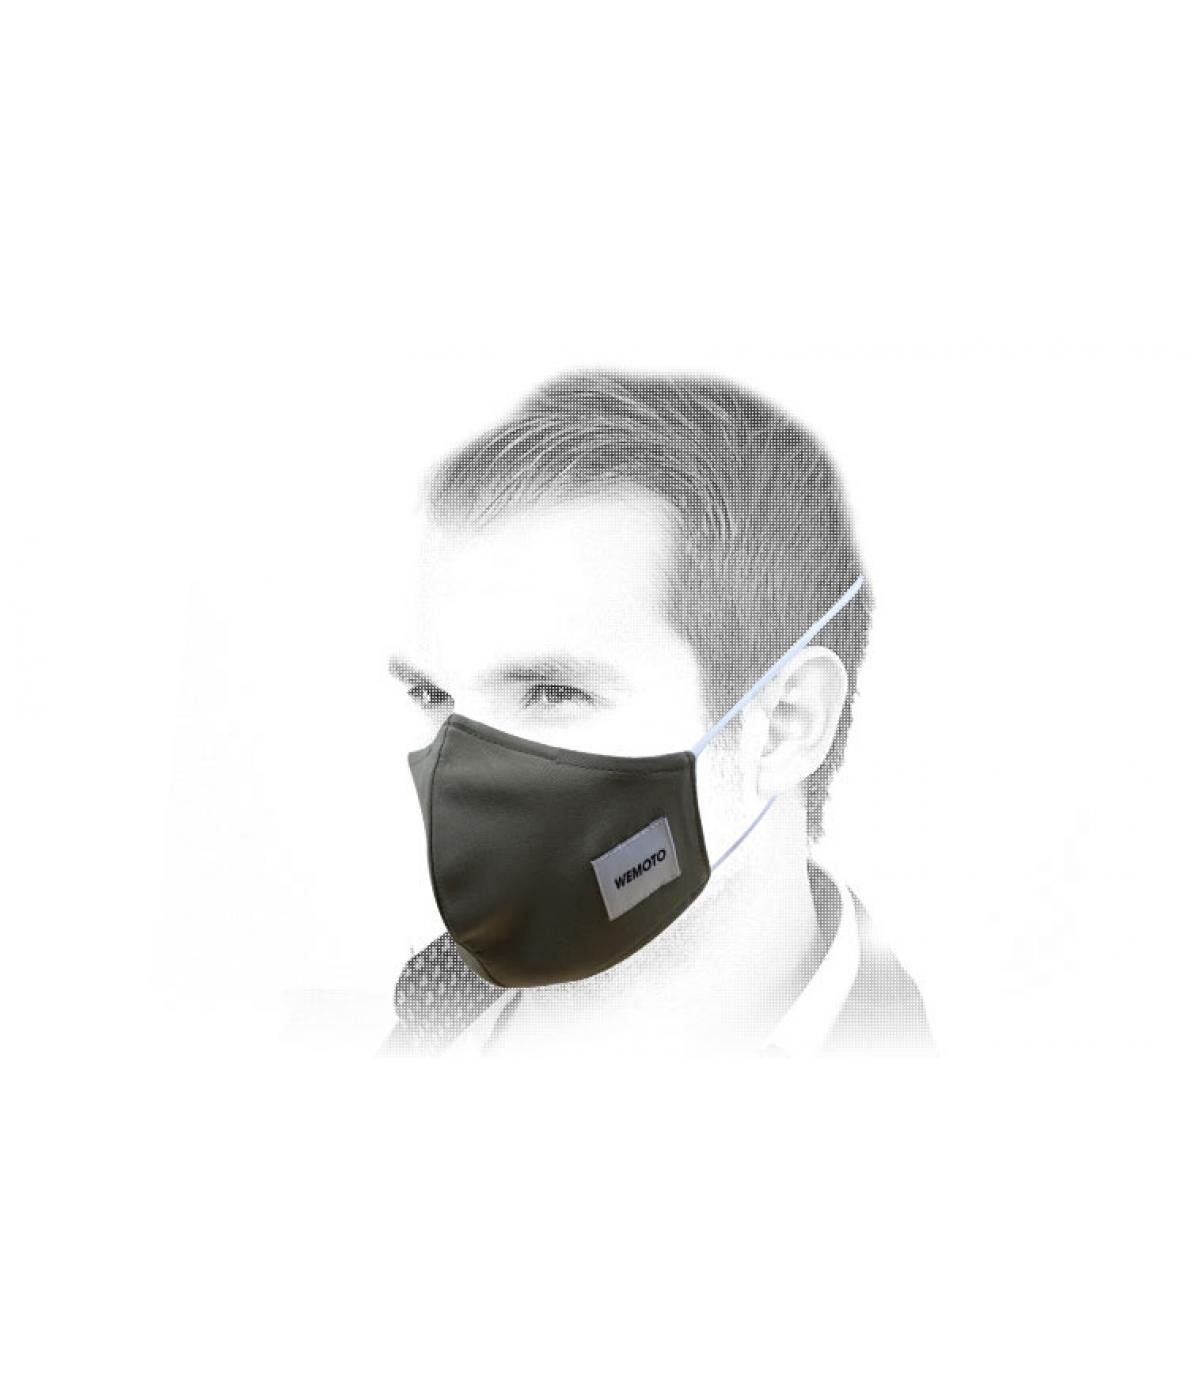 green Wemoto face mask